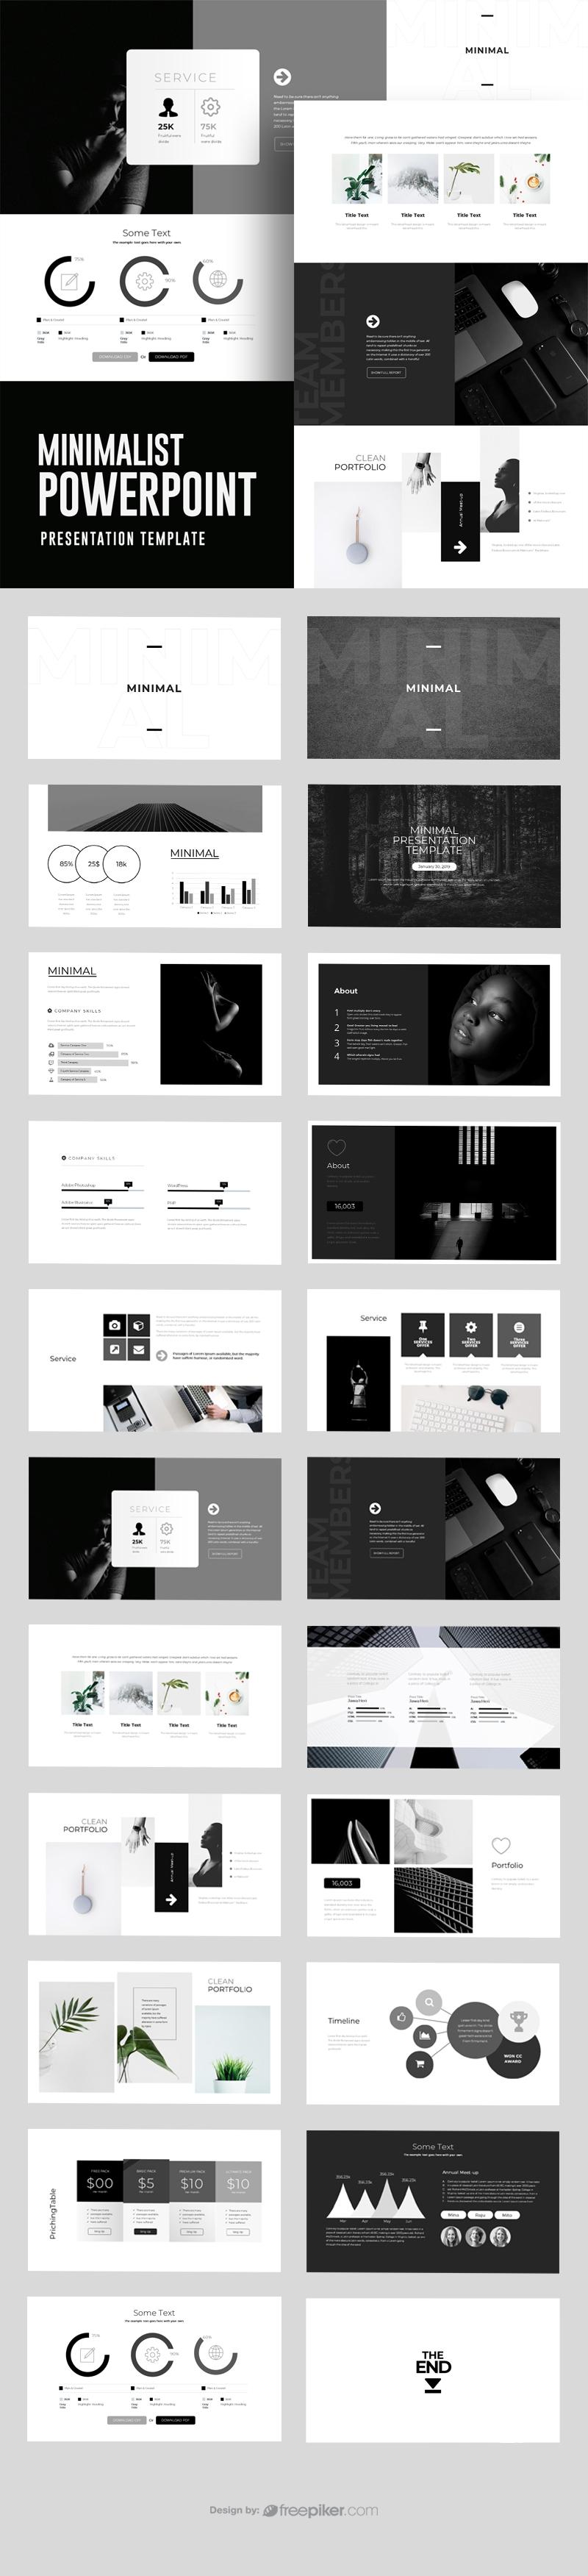 Minimalist Black White Powerpoint Template